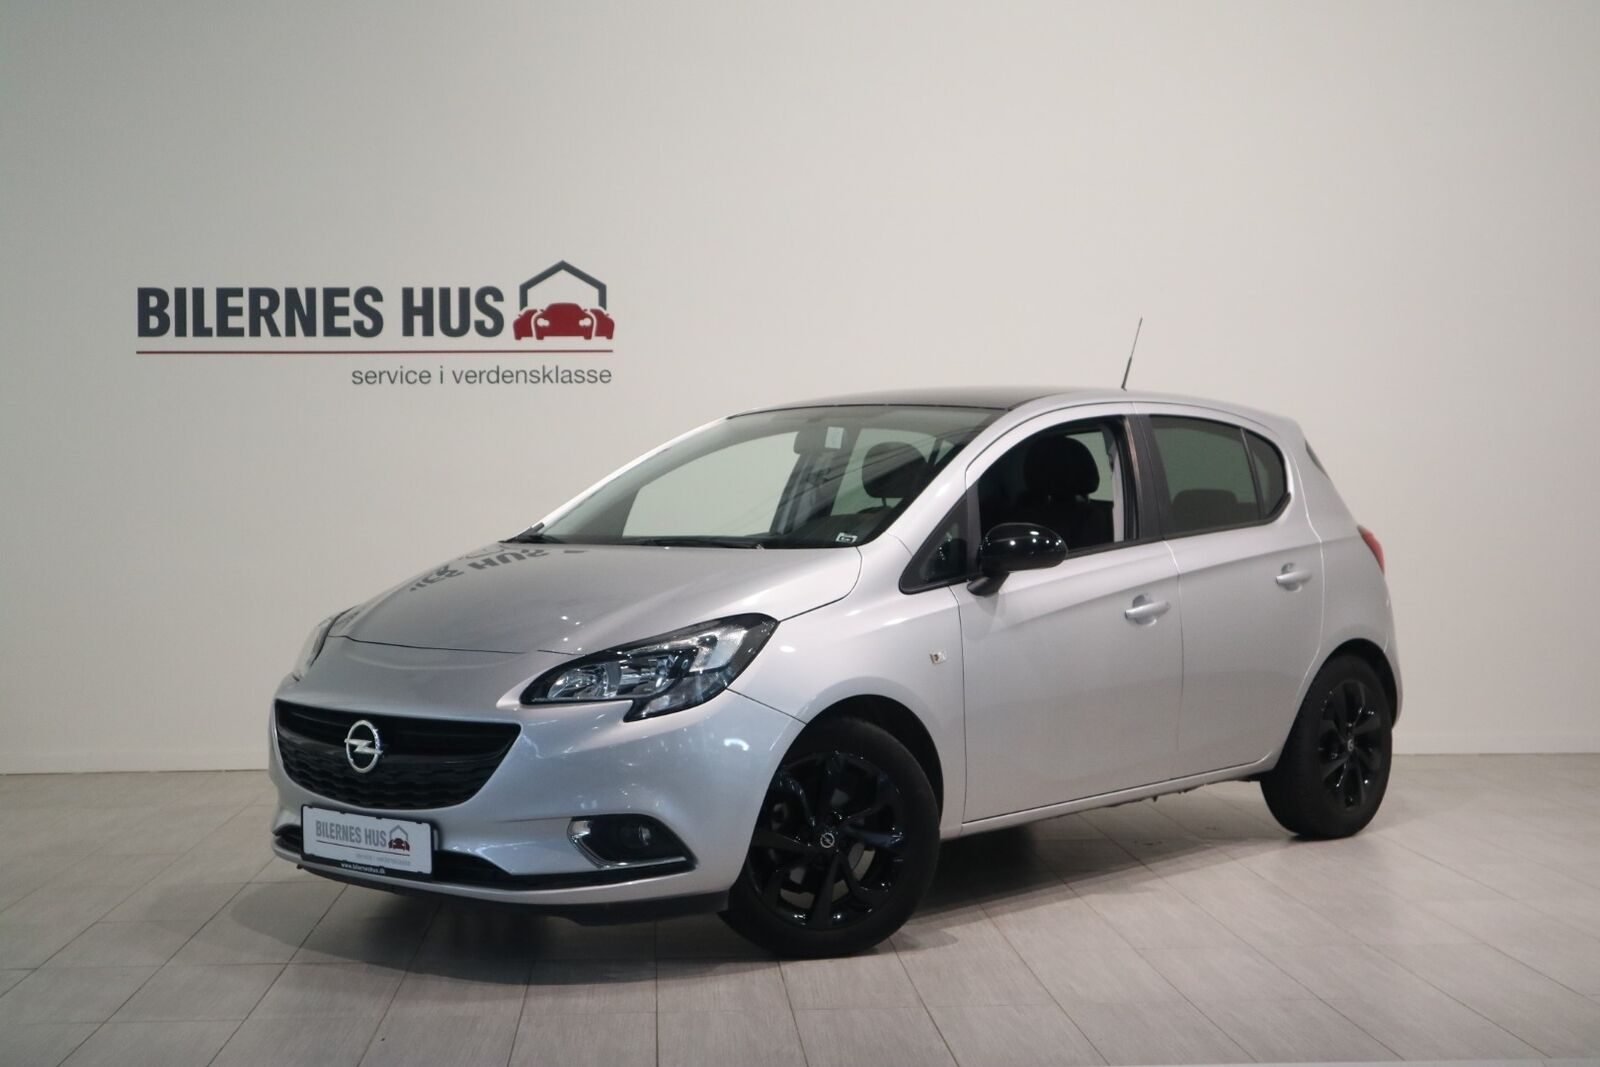 Opel Corsa Billede 2